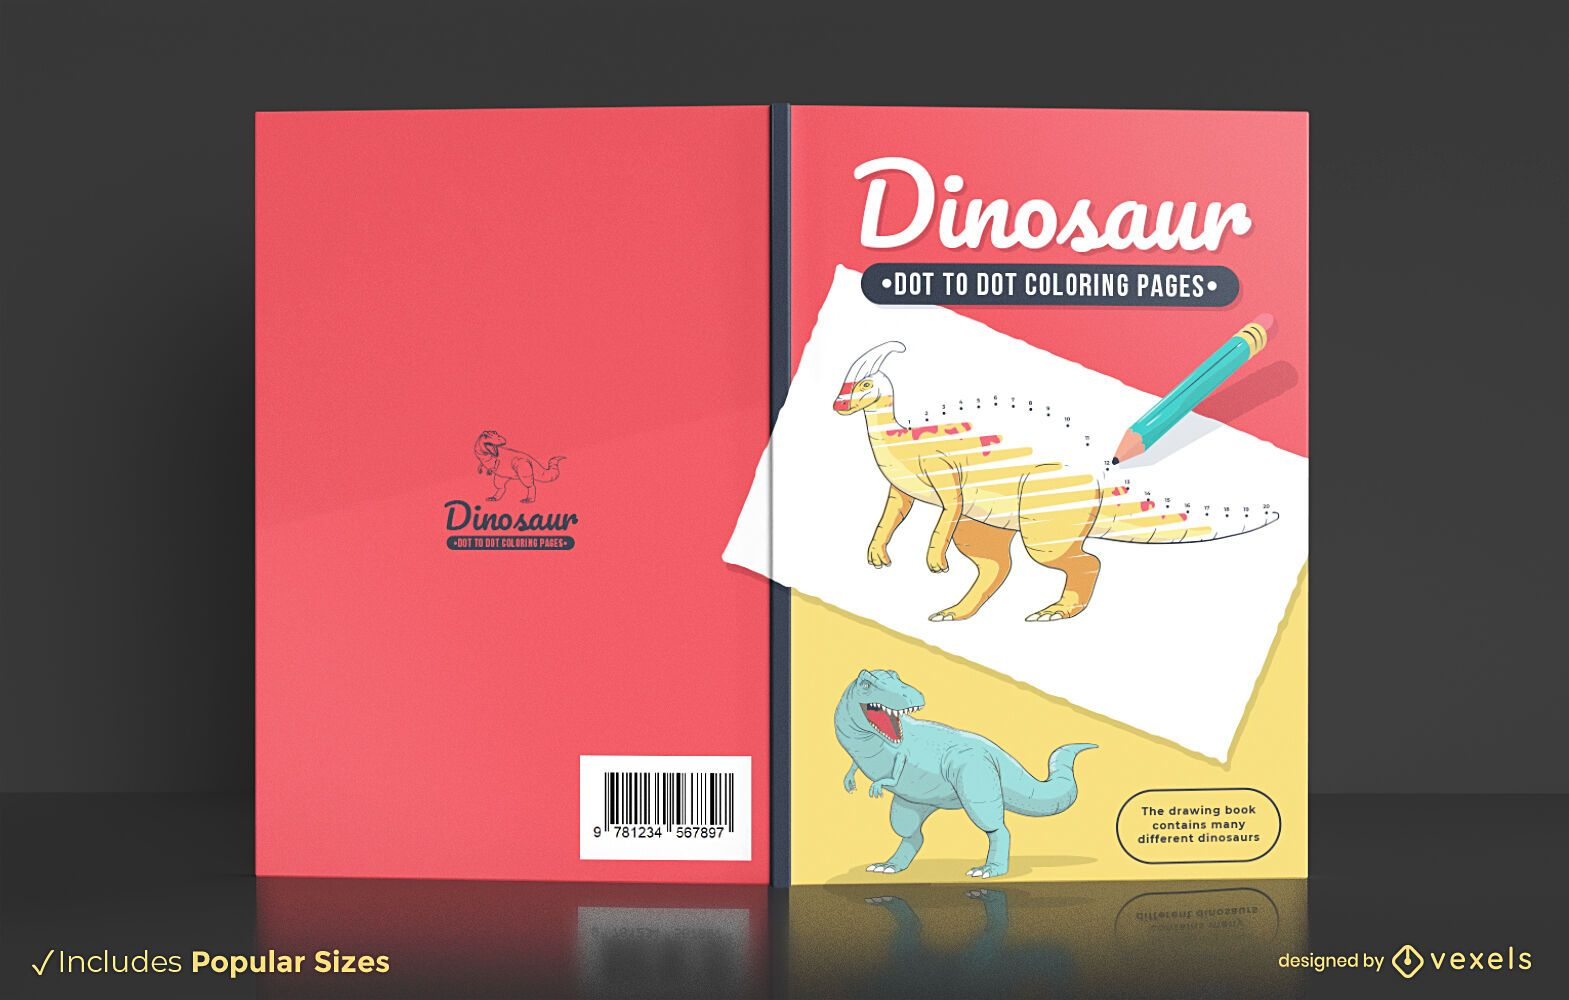 Dinosaur dot to dot coloring book cover design